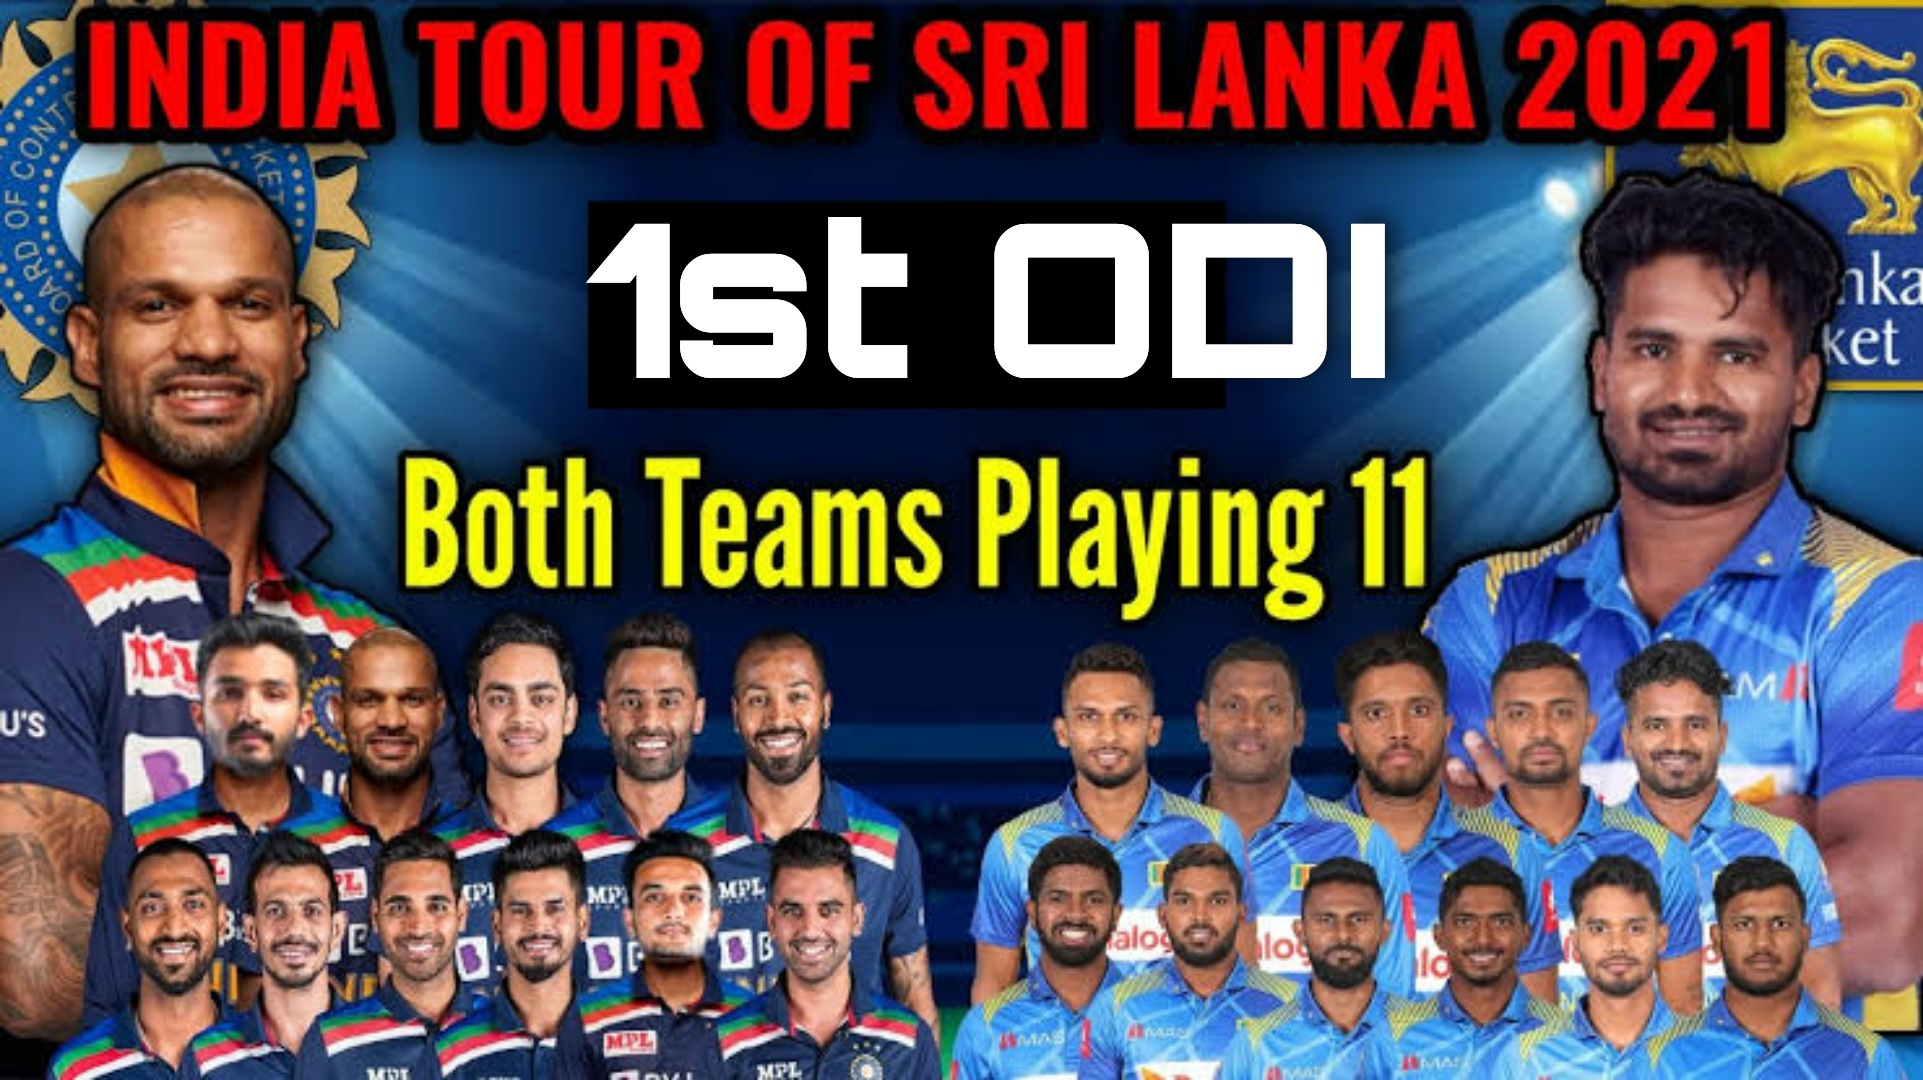 Sri Lanka Vs India 1st ODI Live Streaming | Playing 11